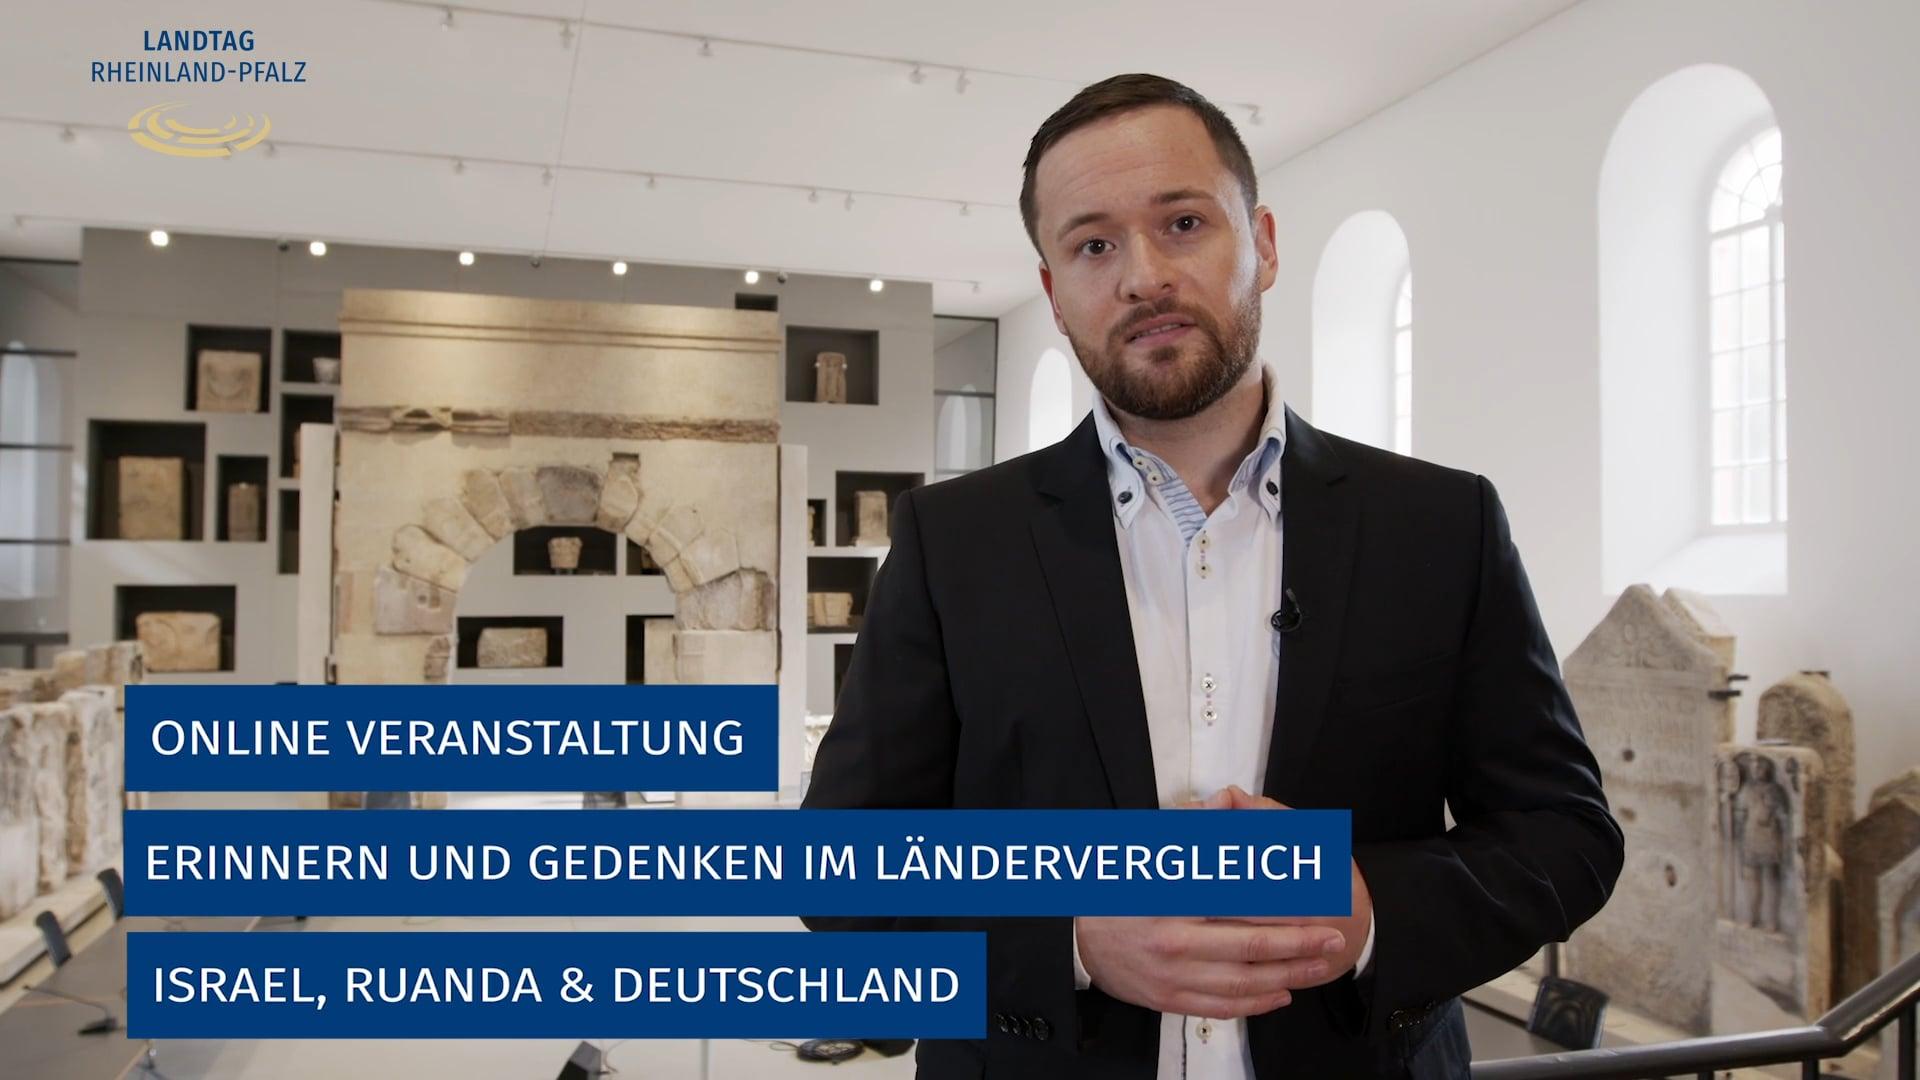 Landtag Rheinland-Pfalz Cultures of Remembrance